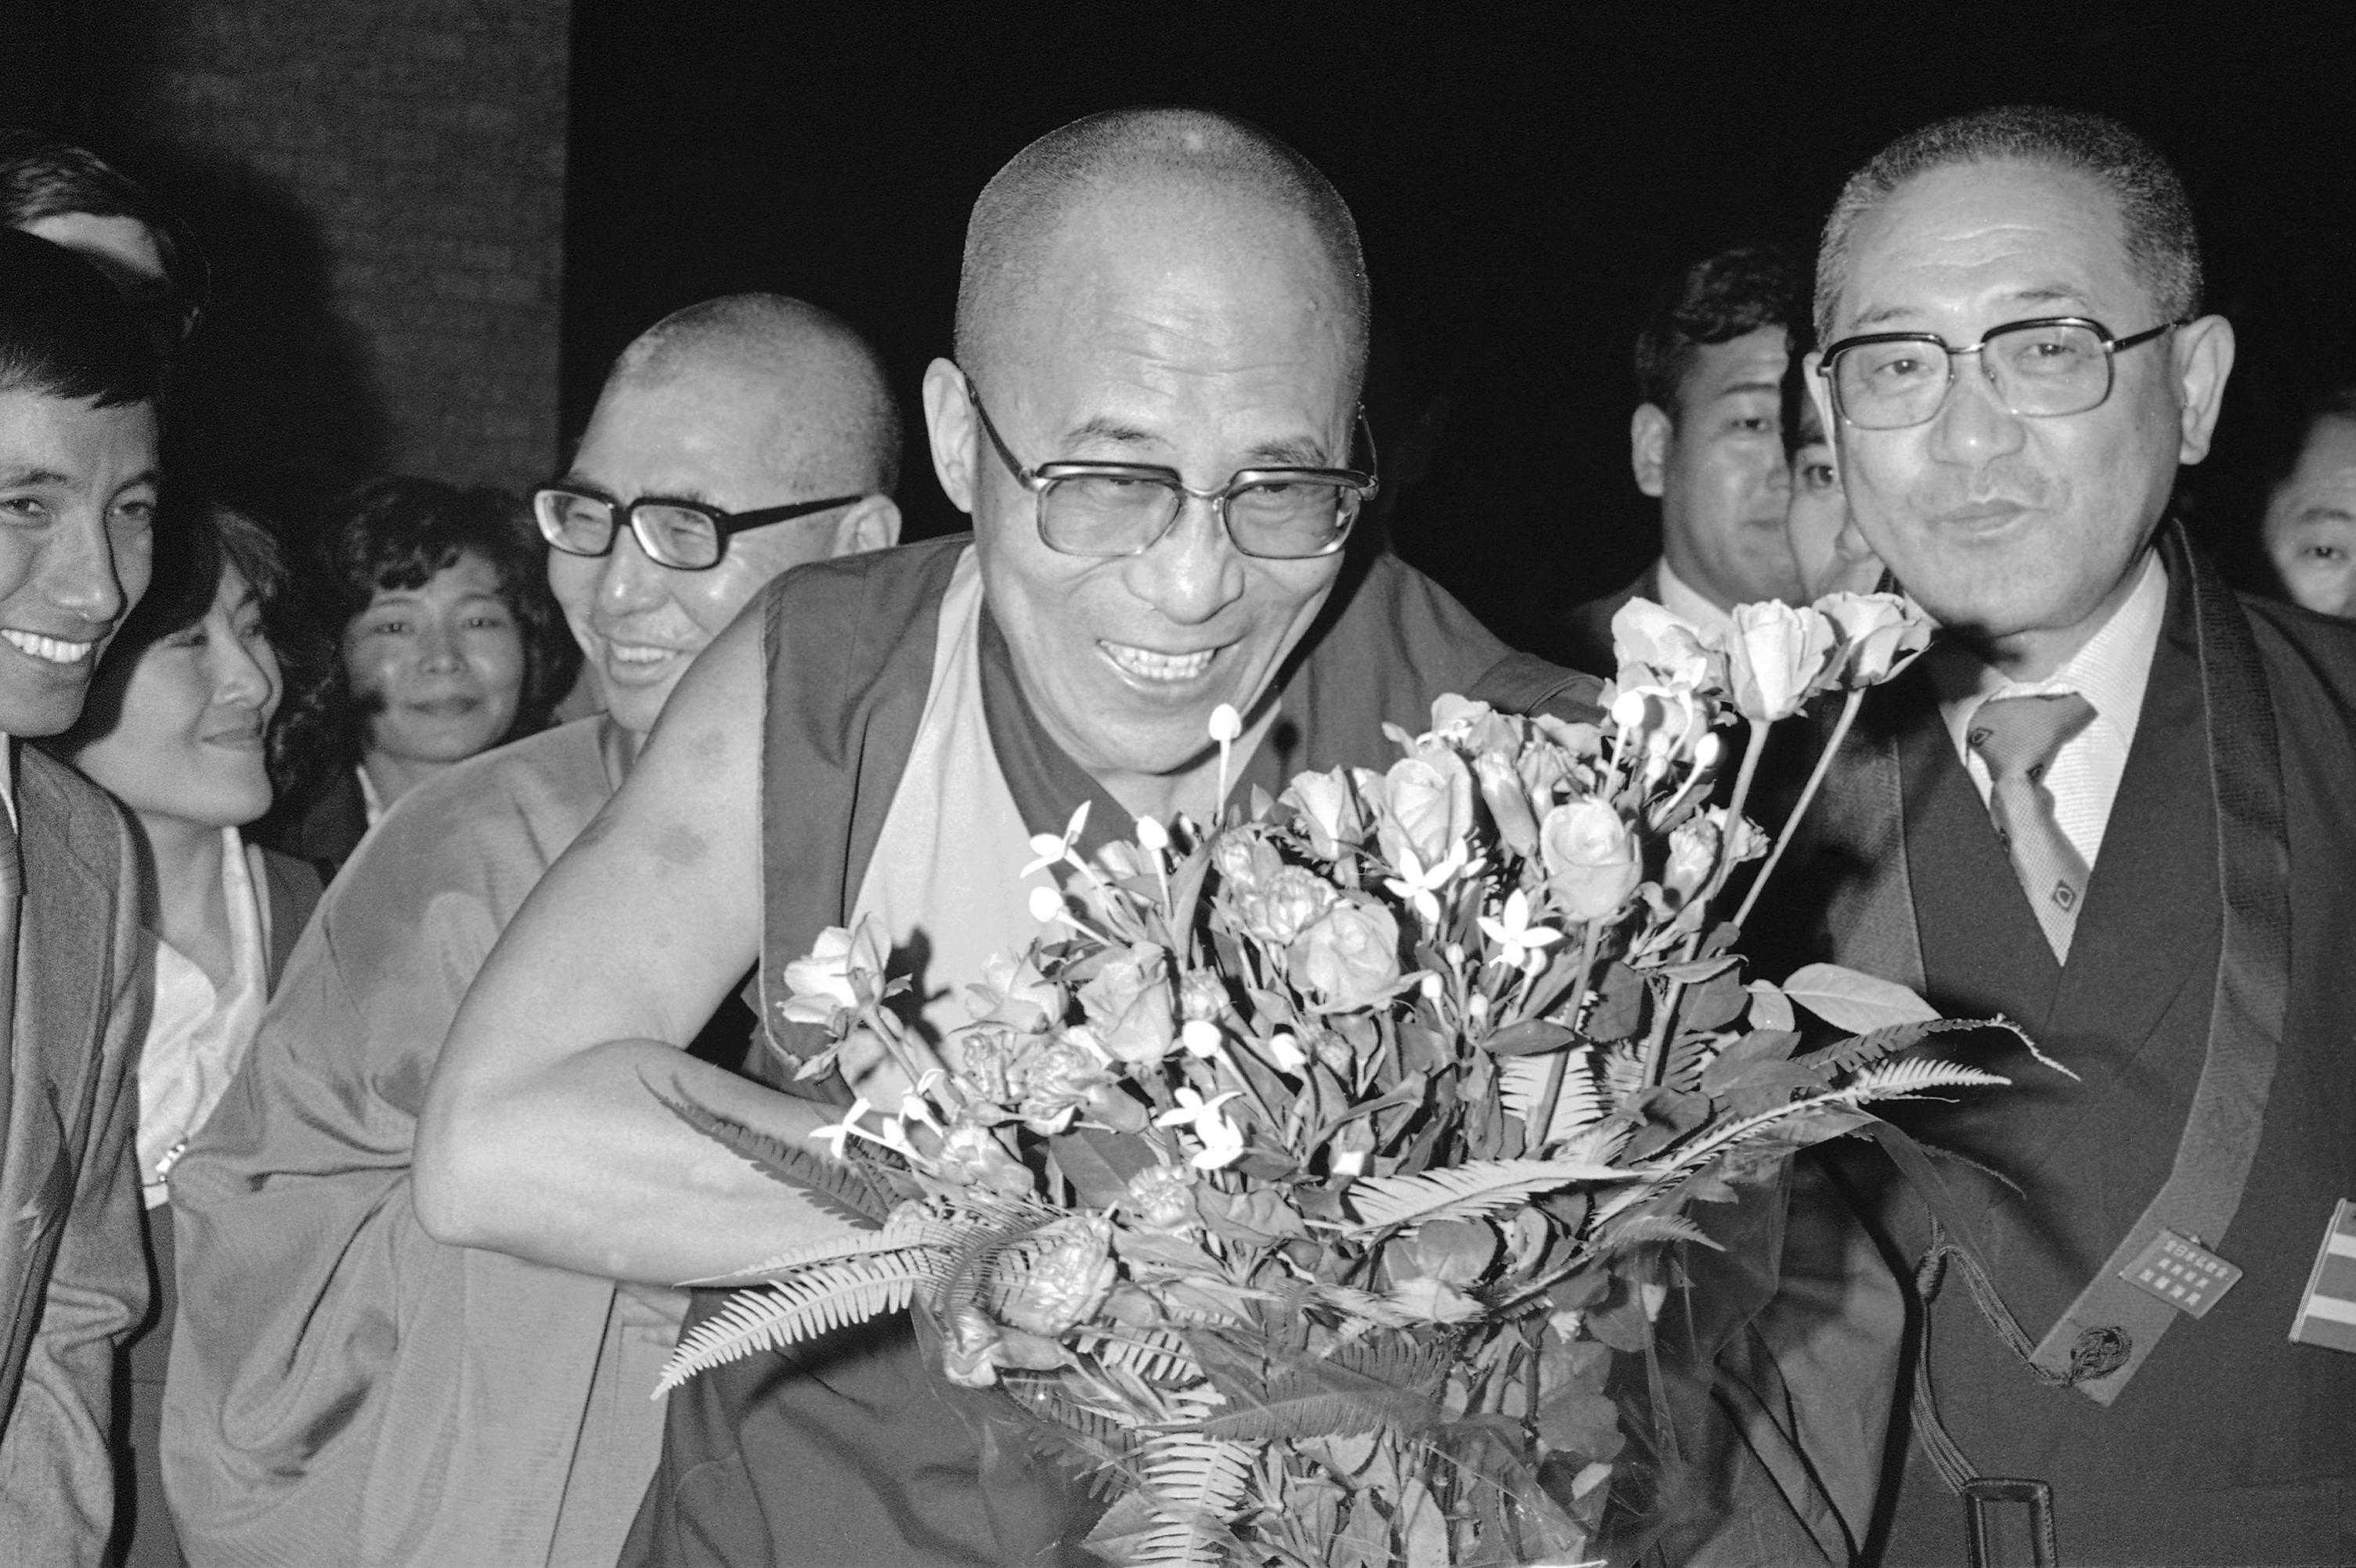 Dalai Lama in Japan